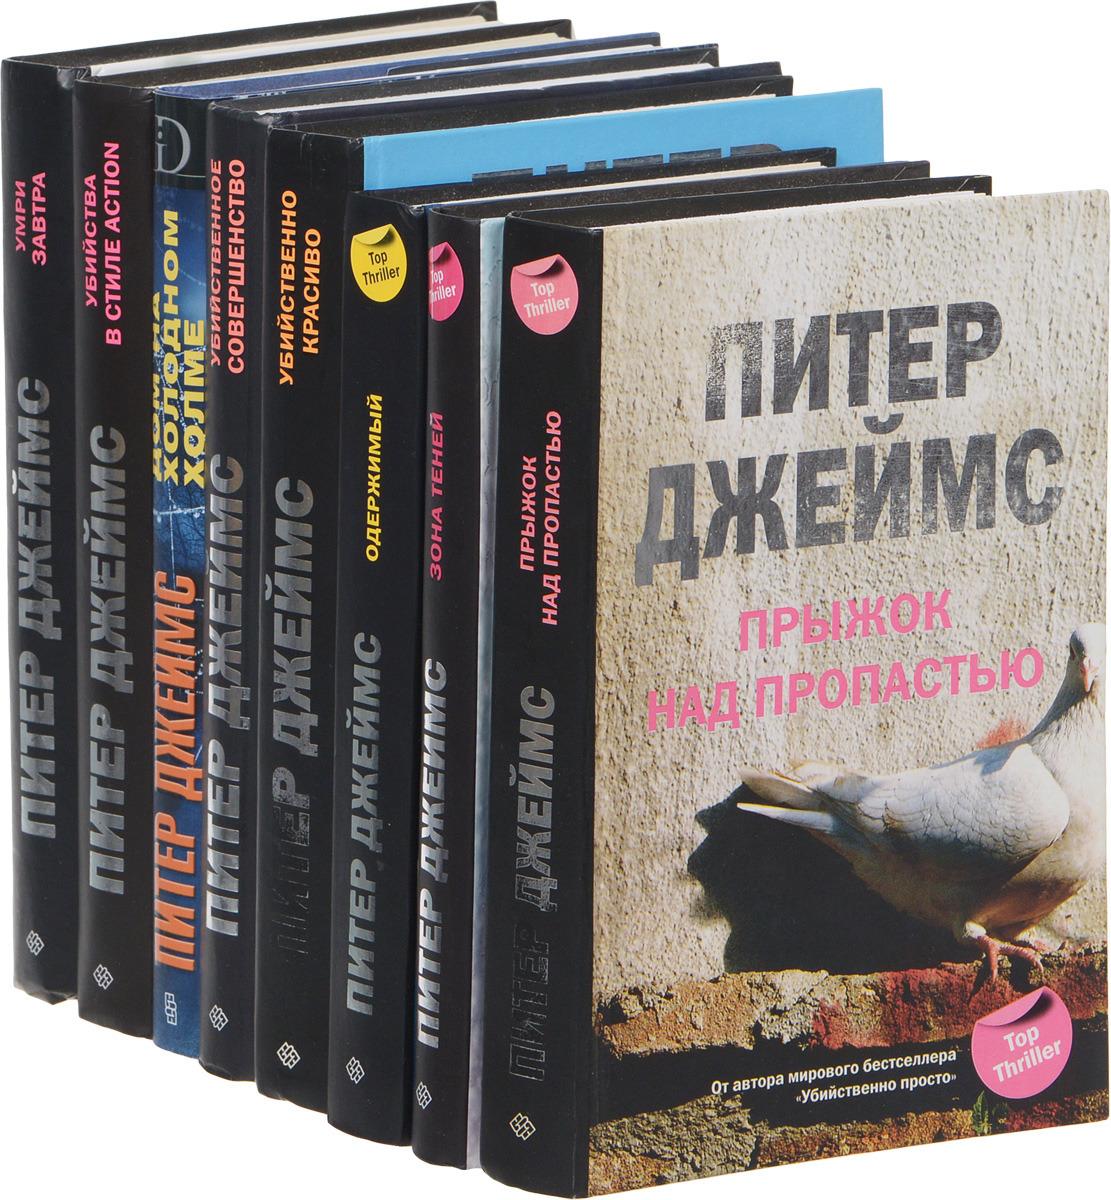 Питер Джеймс Питер Джеймс (комплект из 8 книг)